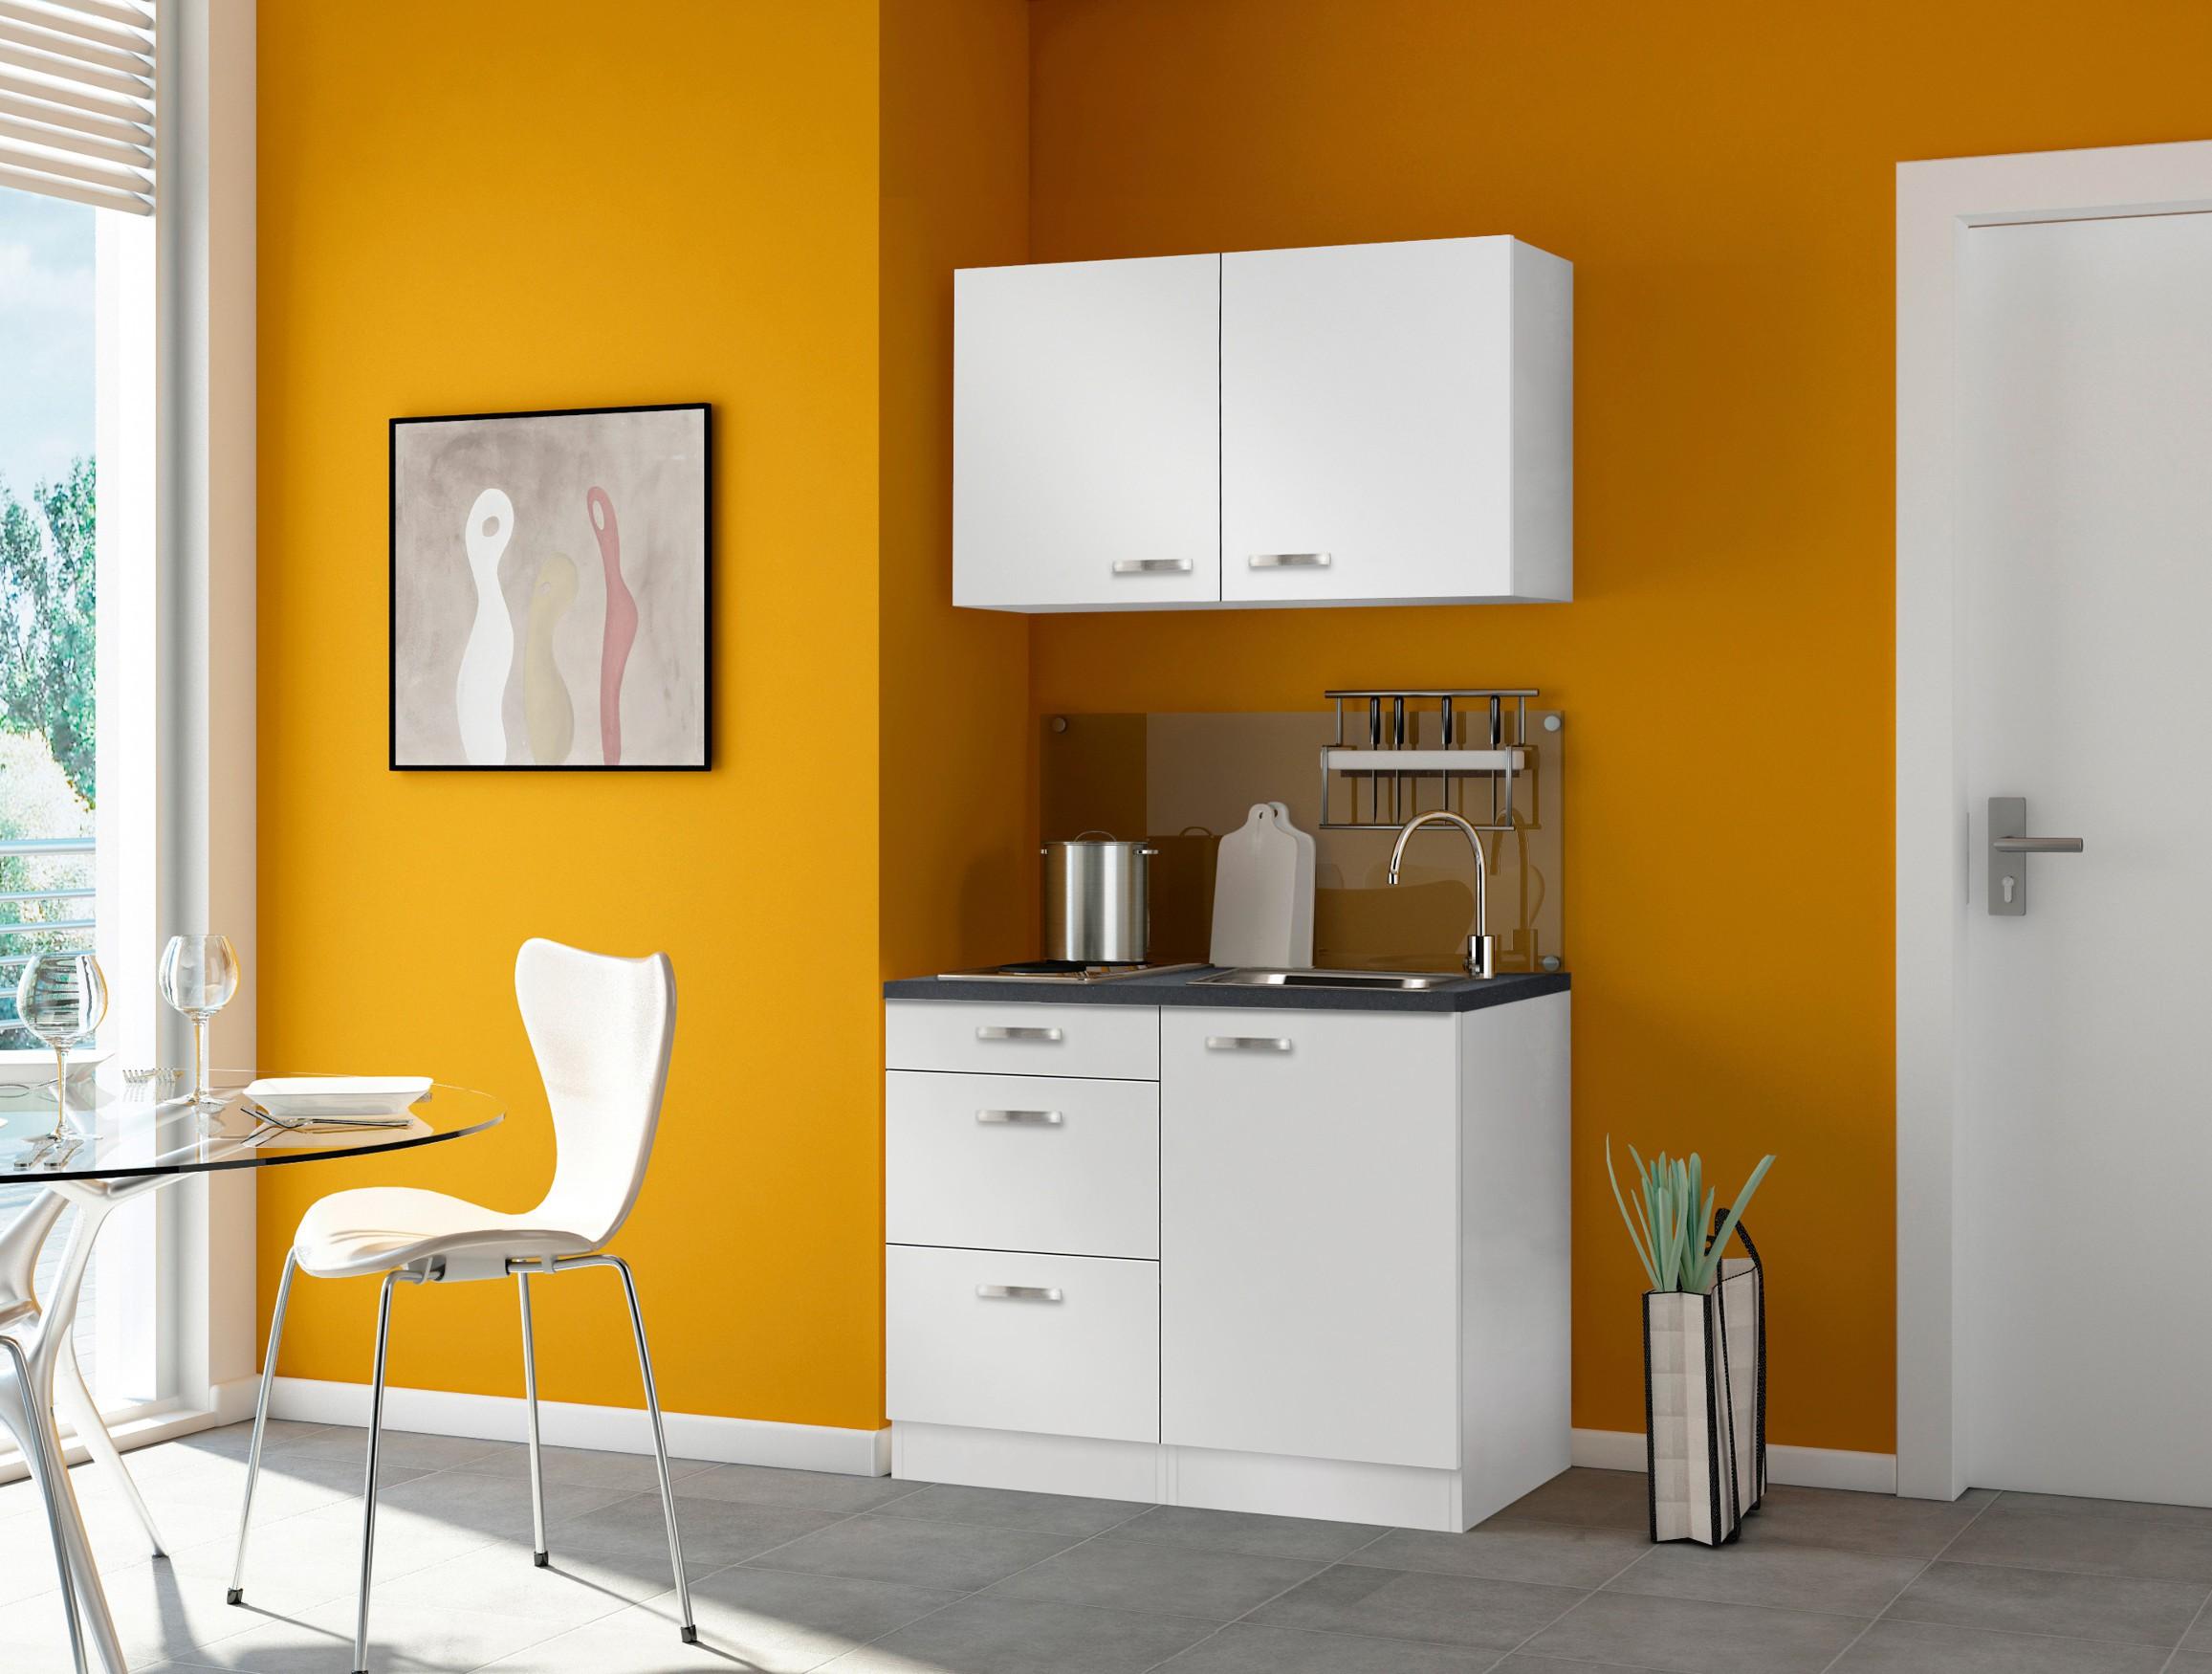 singlek che granada mit elektro kochfeld breite 100 cm wei k che singlek chen. Black Bedroom Furniture Sets. Home Design Ideas